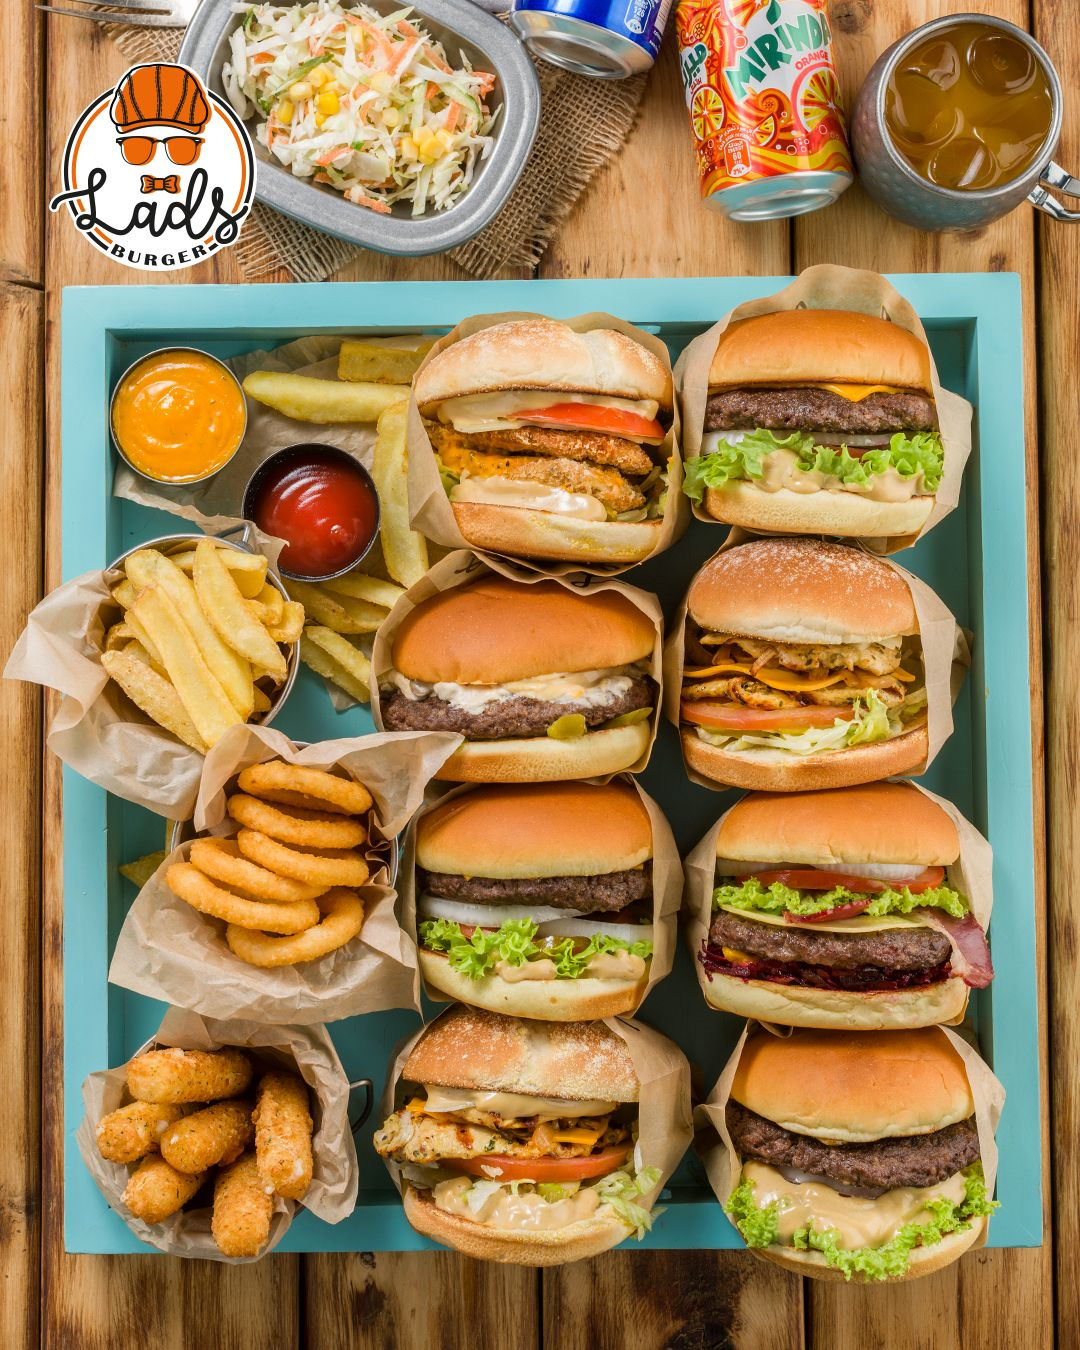 There Is Something For Everyone S Taste Lads Variety Ladsburger Ladsburgerdubai Burger Dubai Mydubai Burgerdubai Duba Burger Food Homemade Condiments